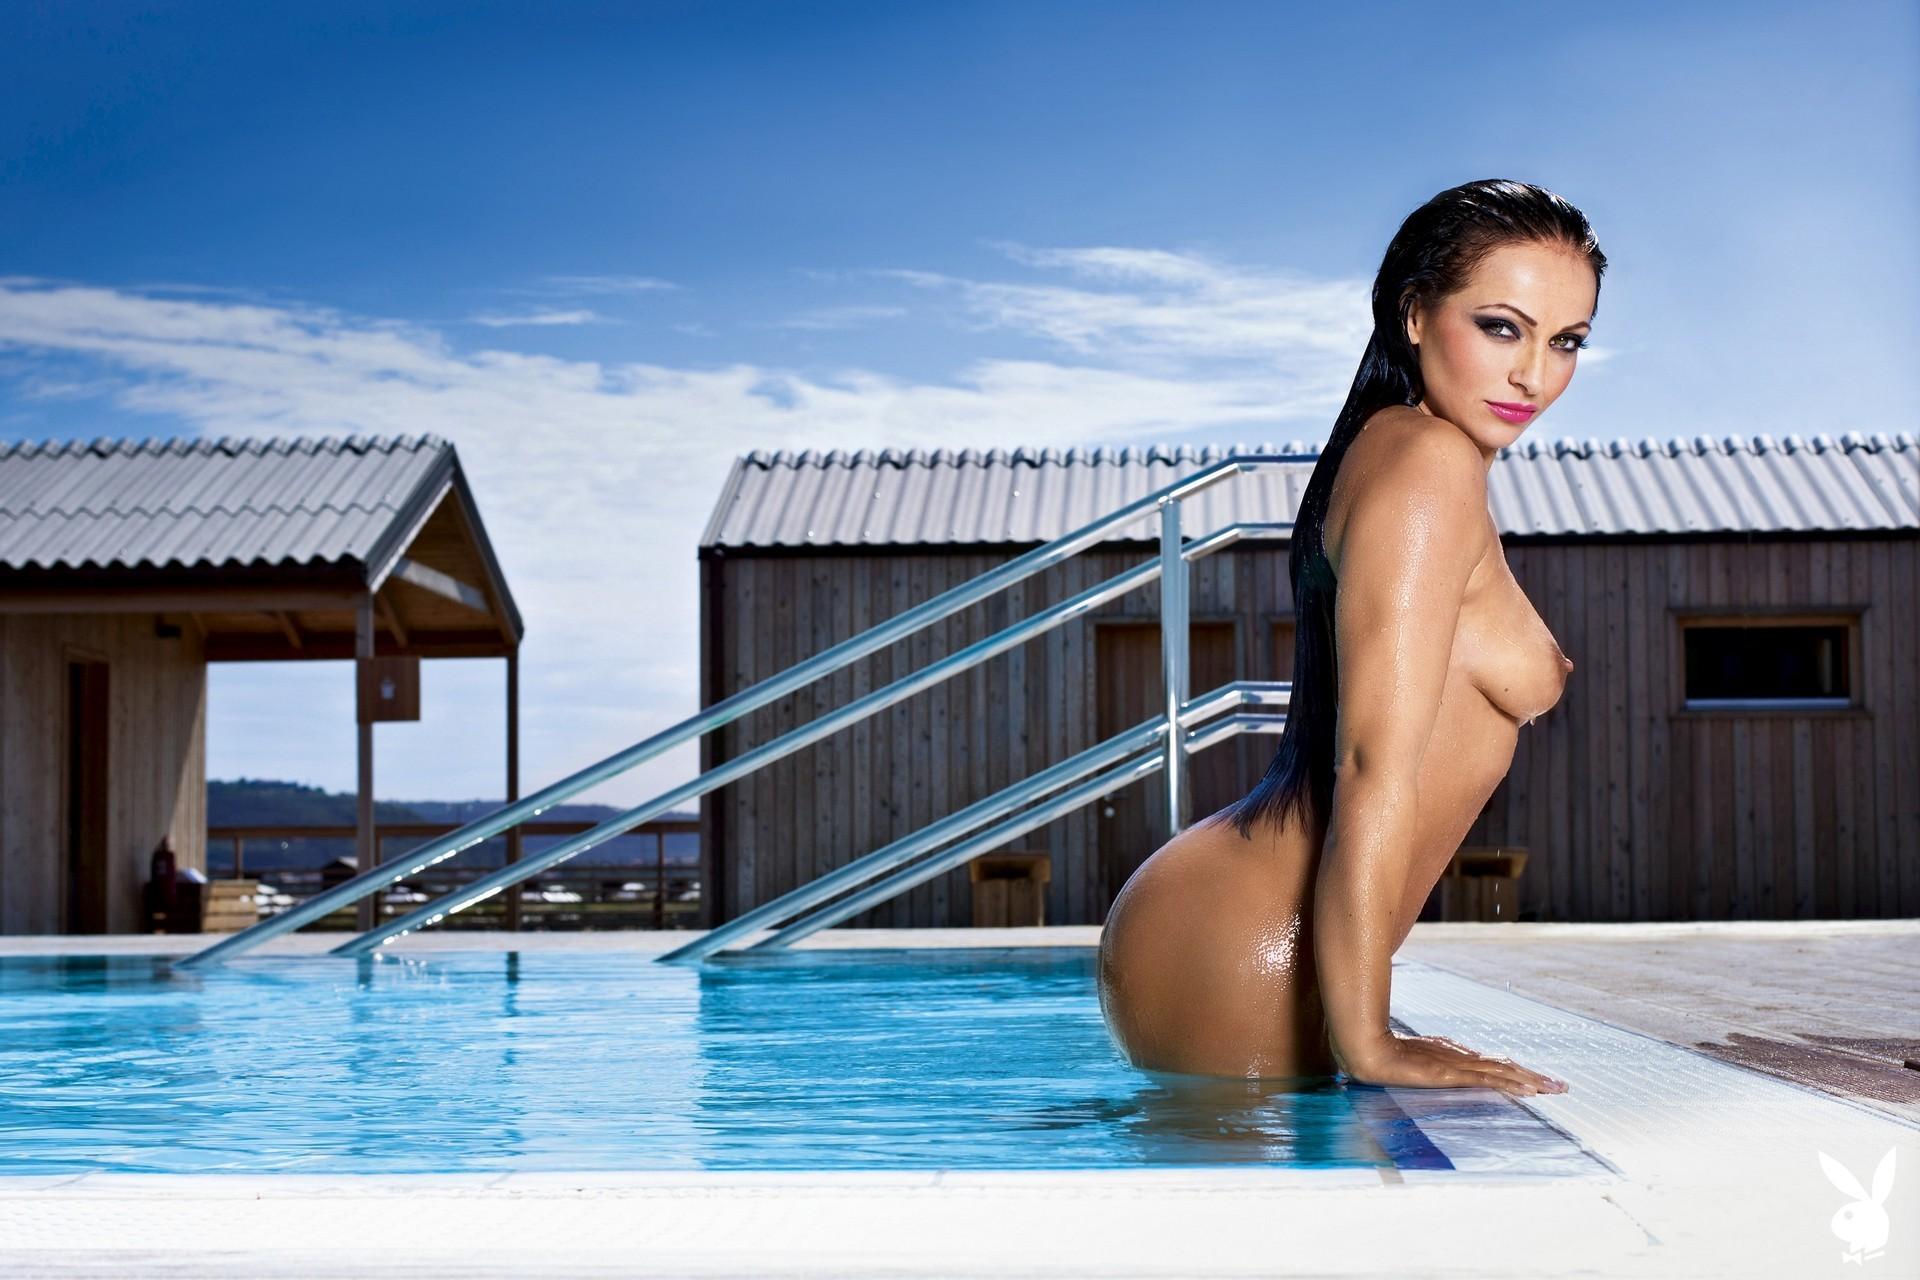 Spa, Resort, Swmming Pool, Wet, Water,